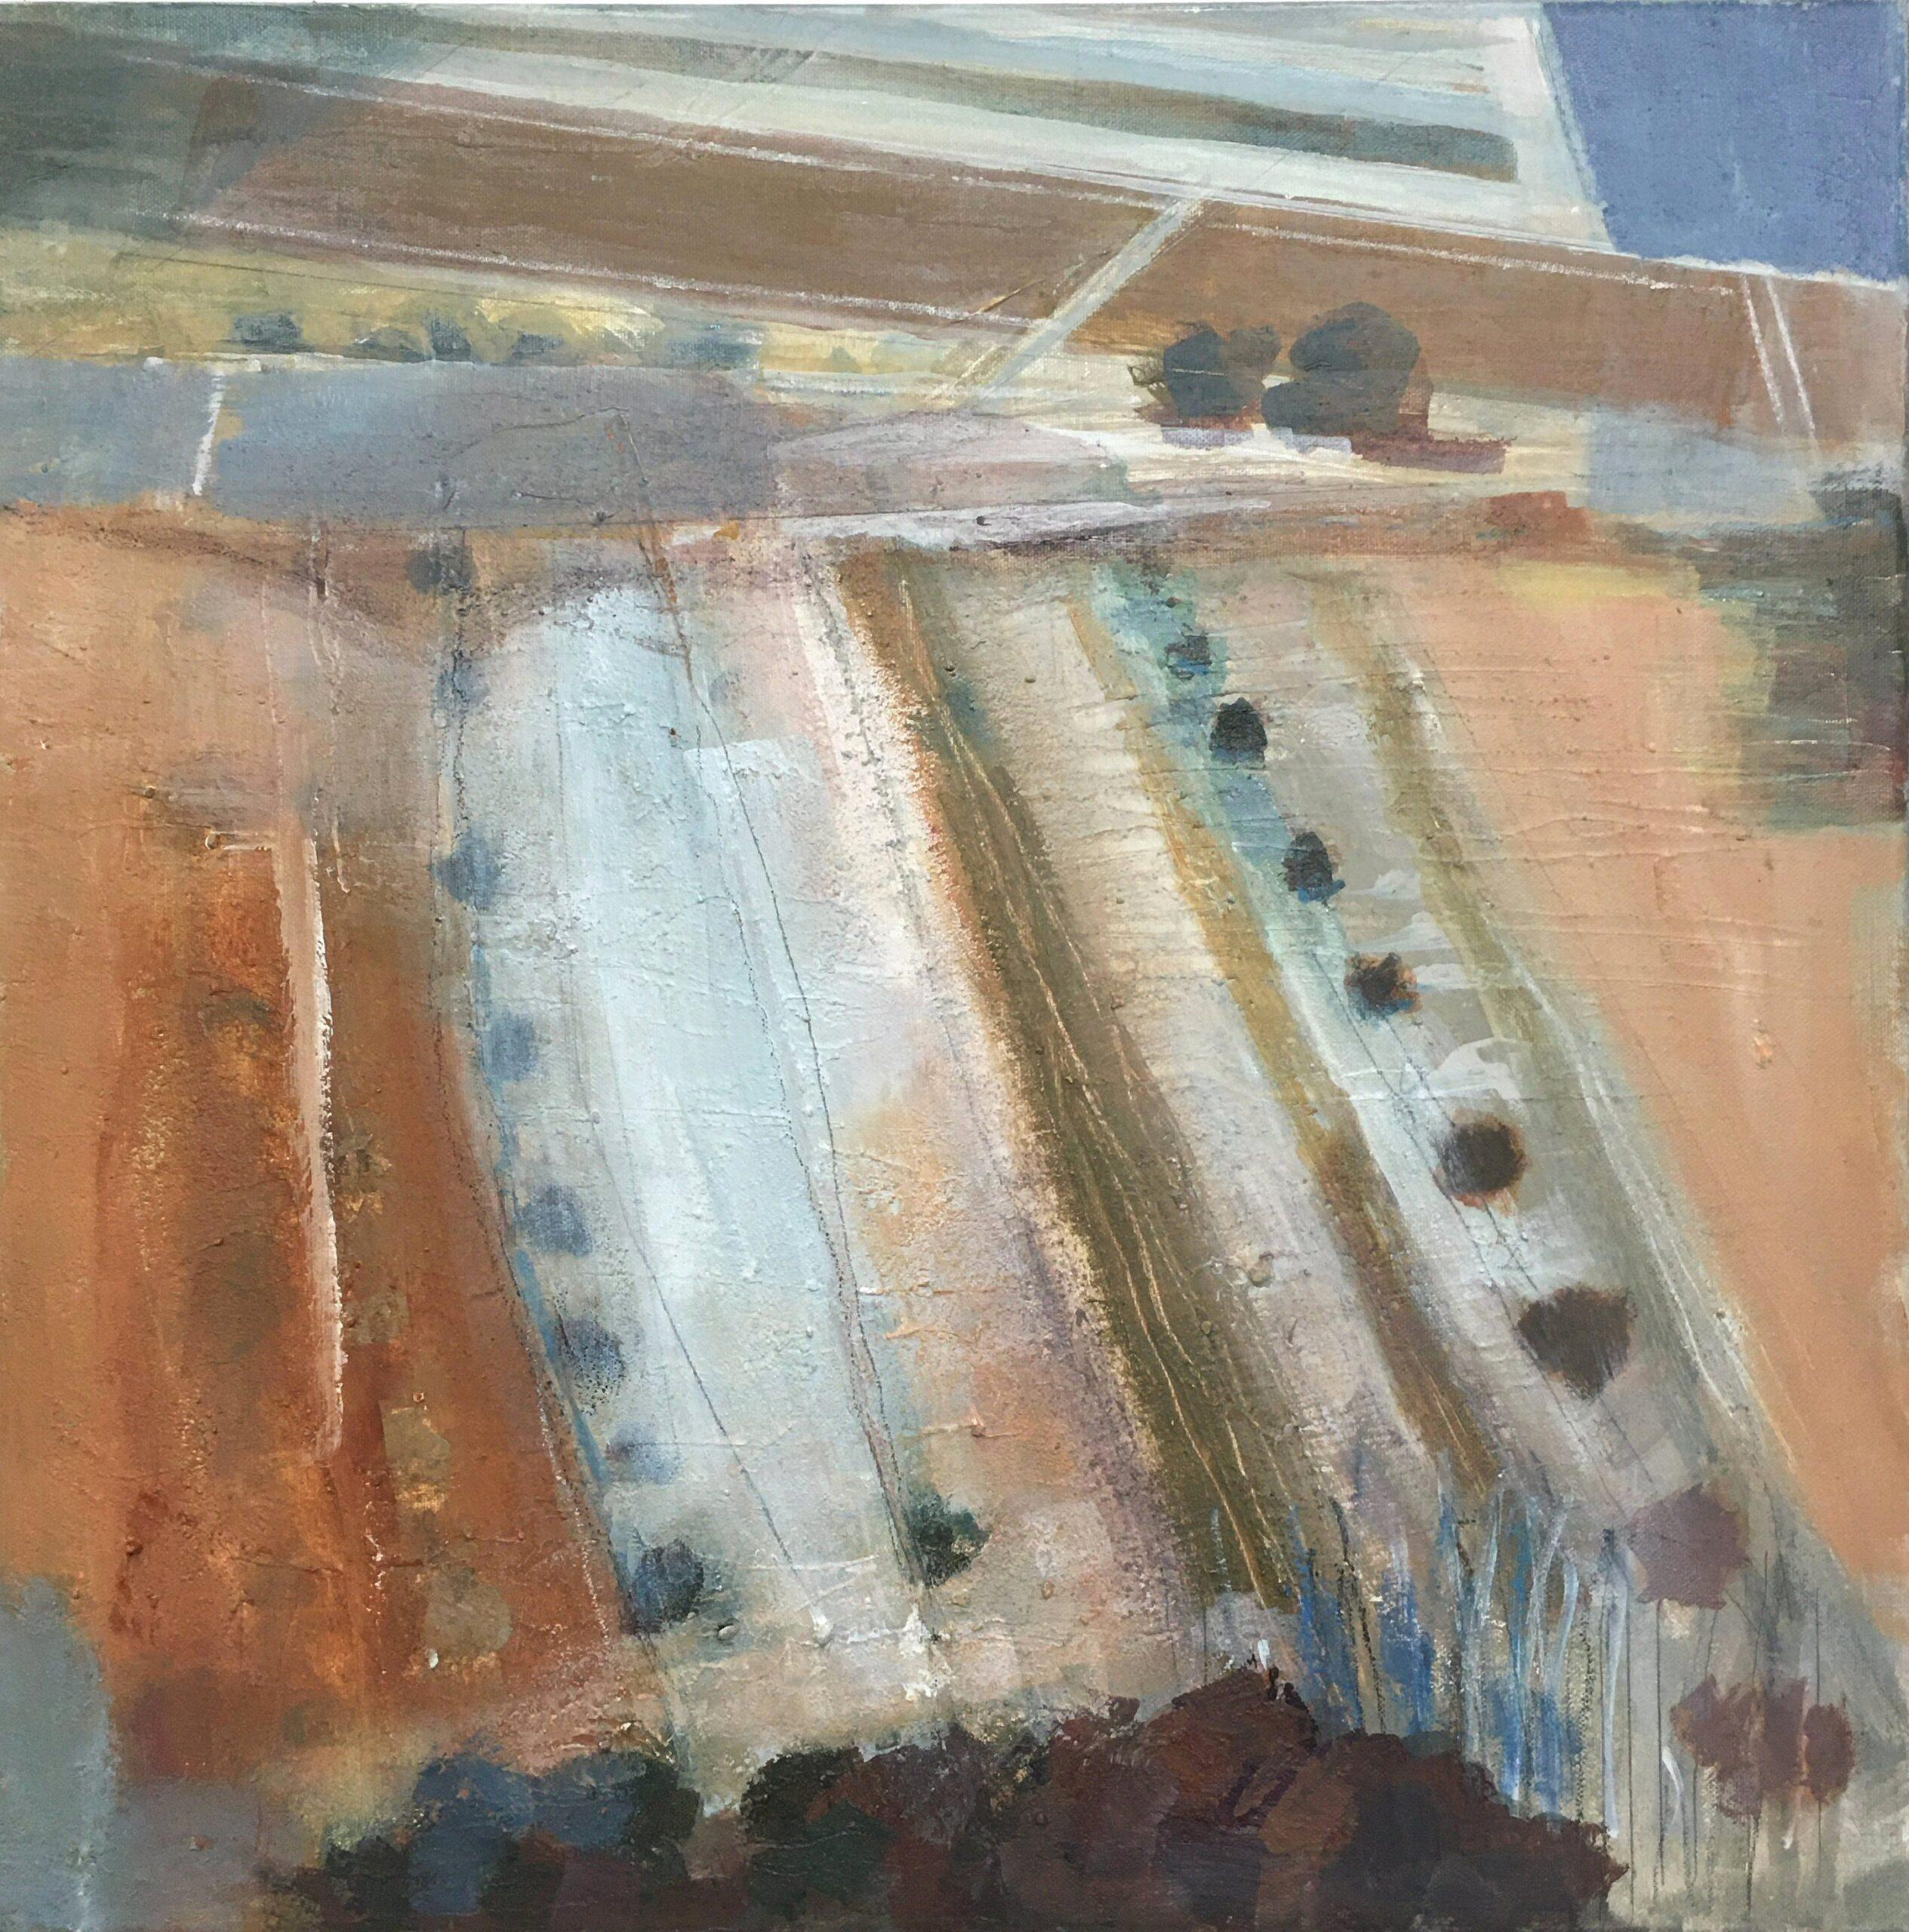 Anthea Eames